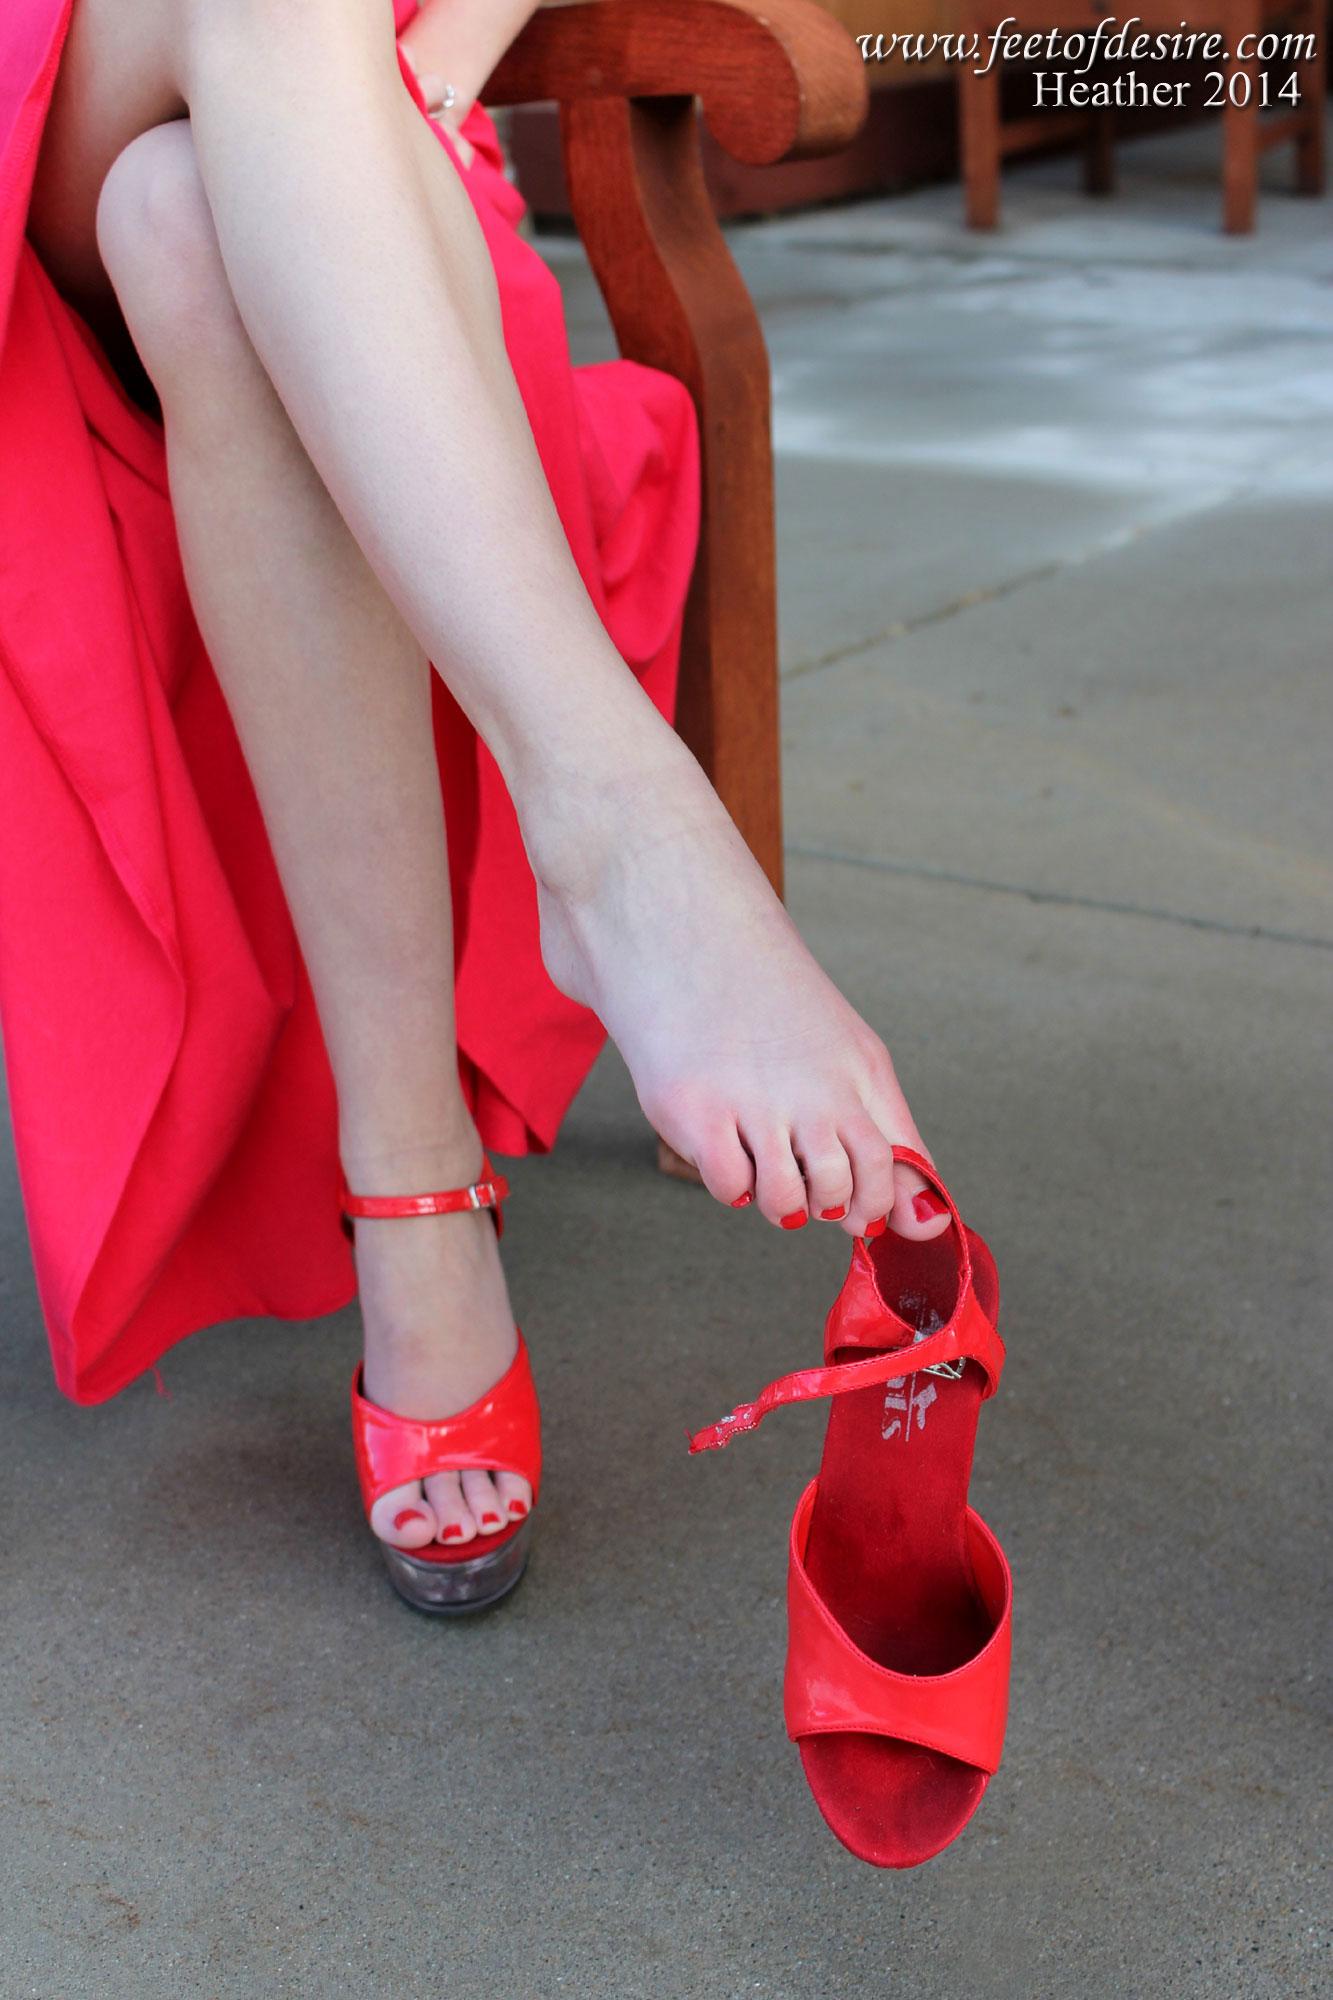 Feet Links Heather